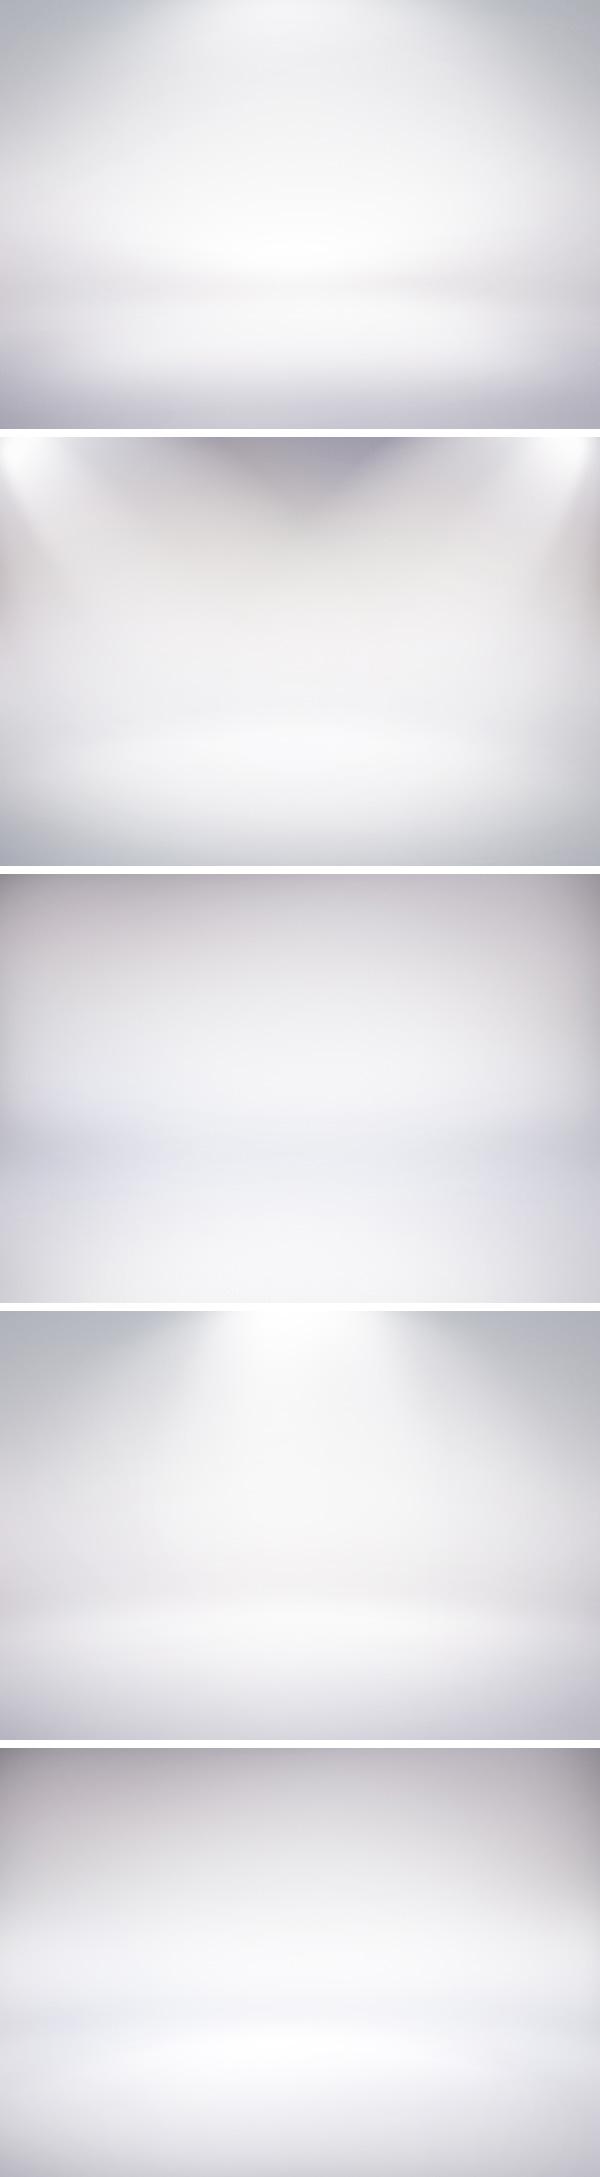 Infinite-White-600-1